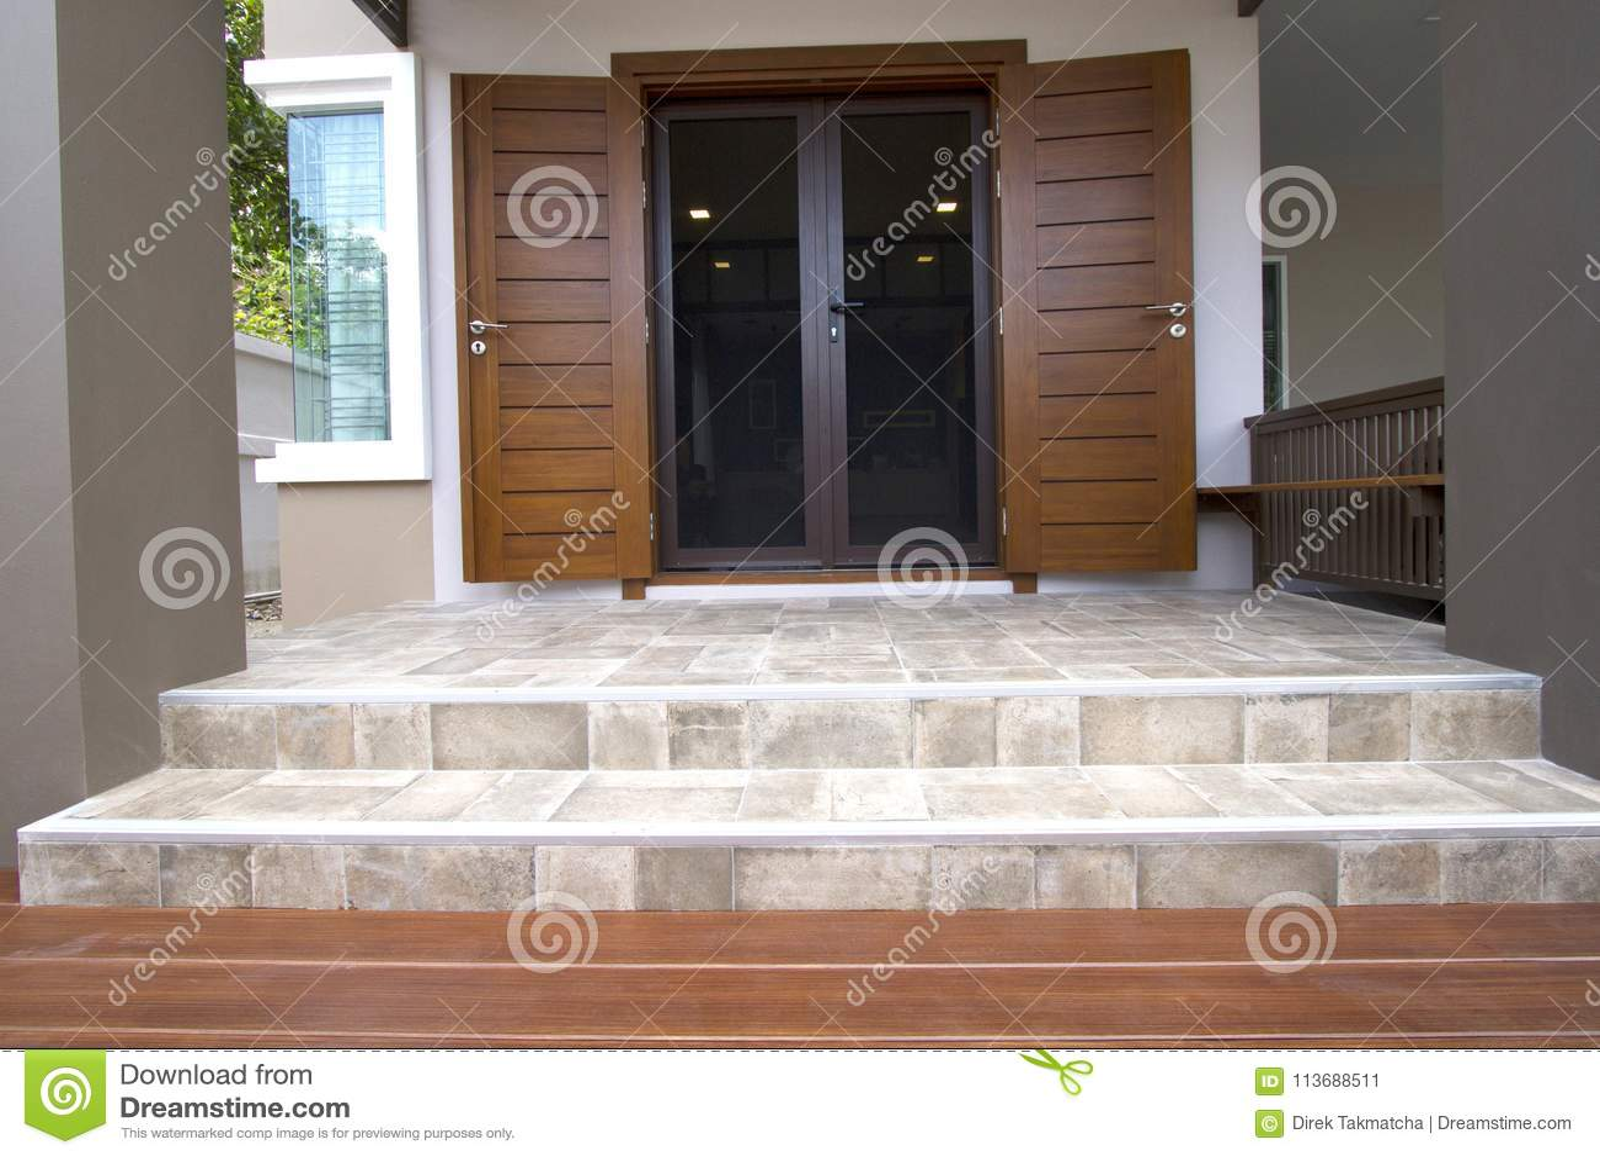 New modern house exterior